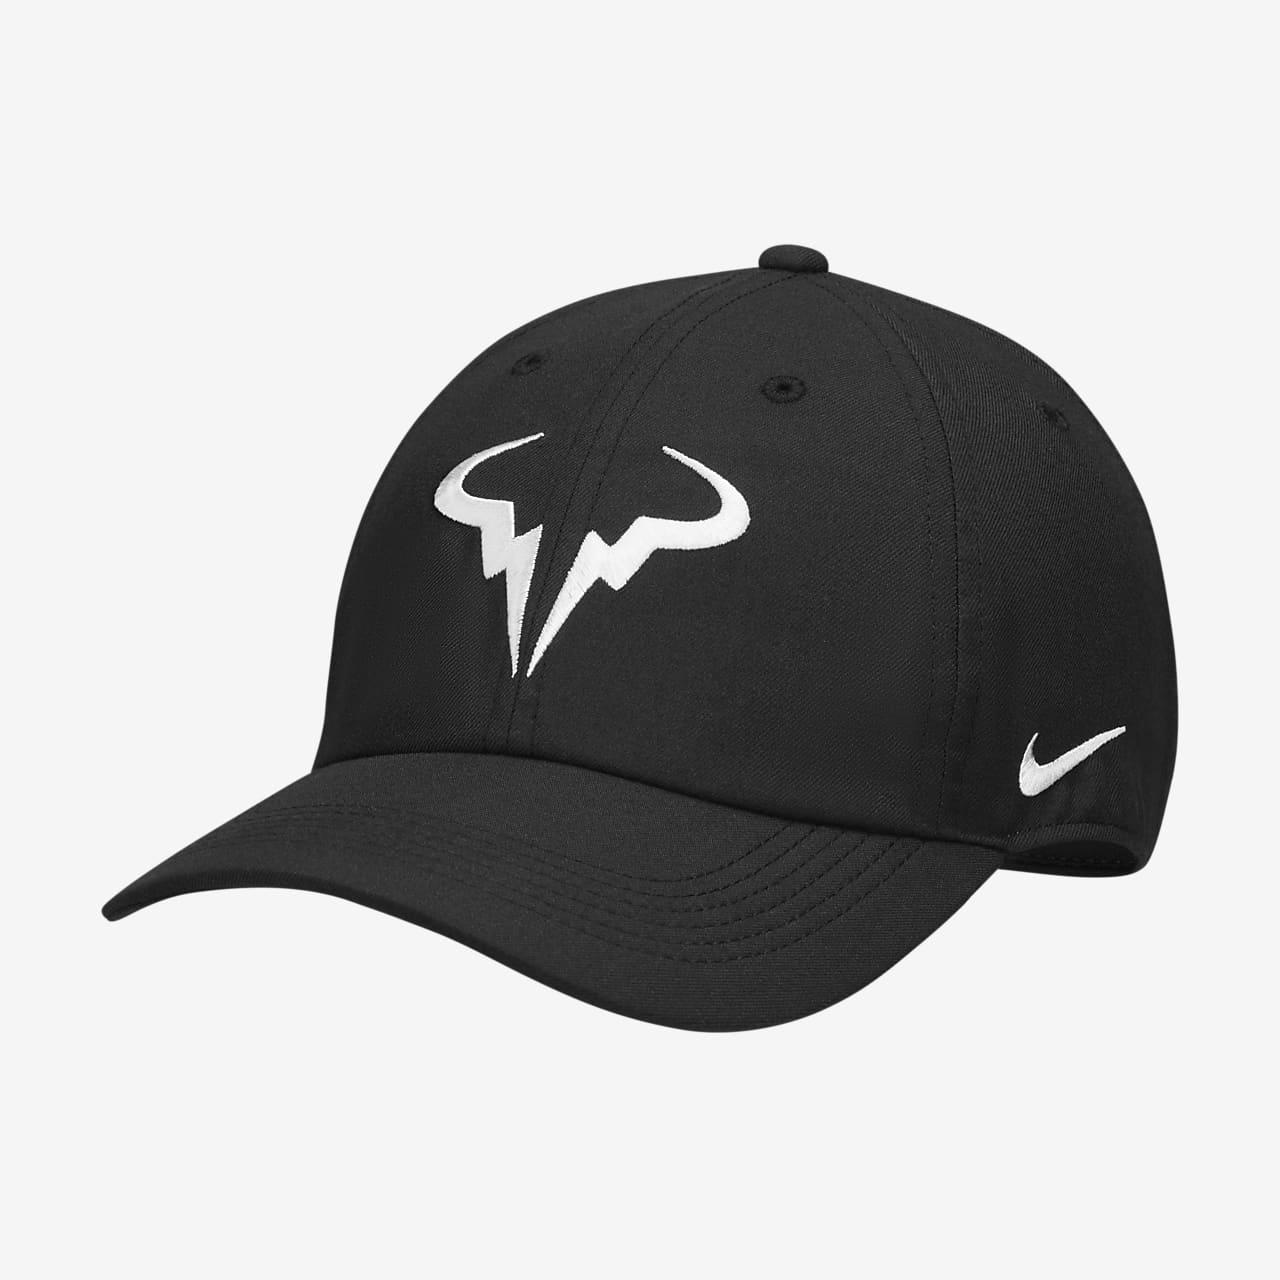 NikeCourt AeroBill Rafa H86 Adjustable Tennis Hat